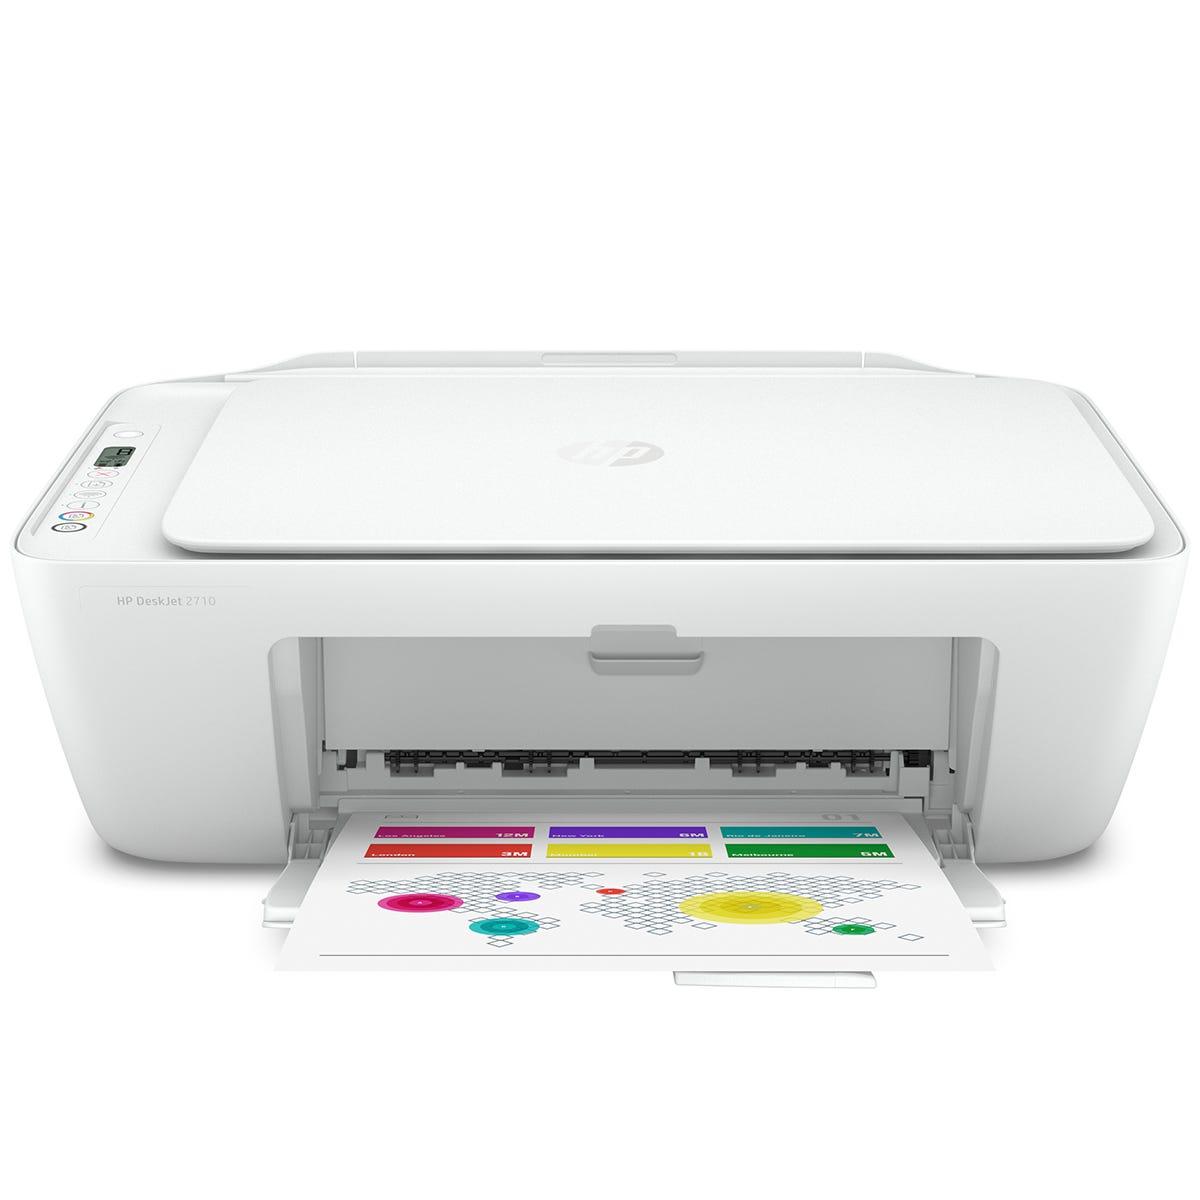 HP Deskjet 2710 Wireless All-in-One Printer - White